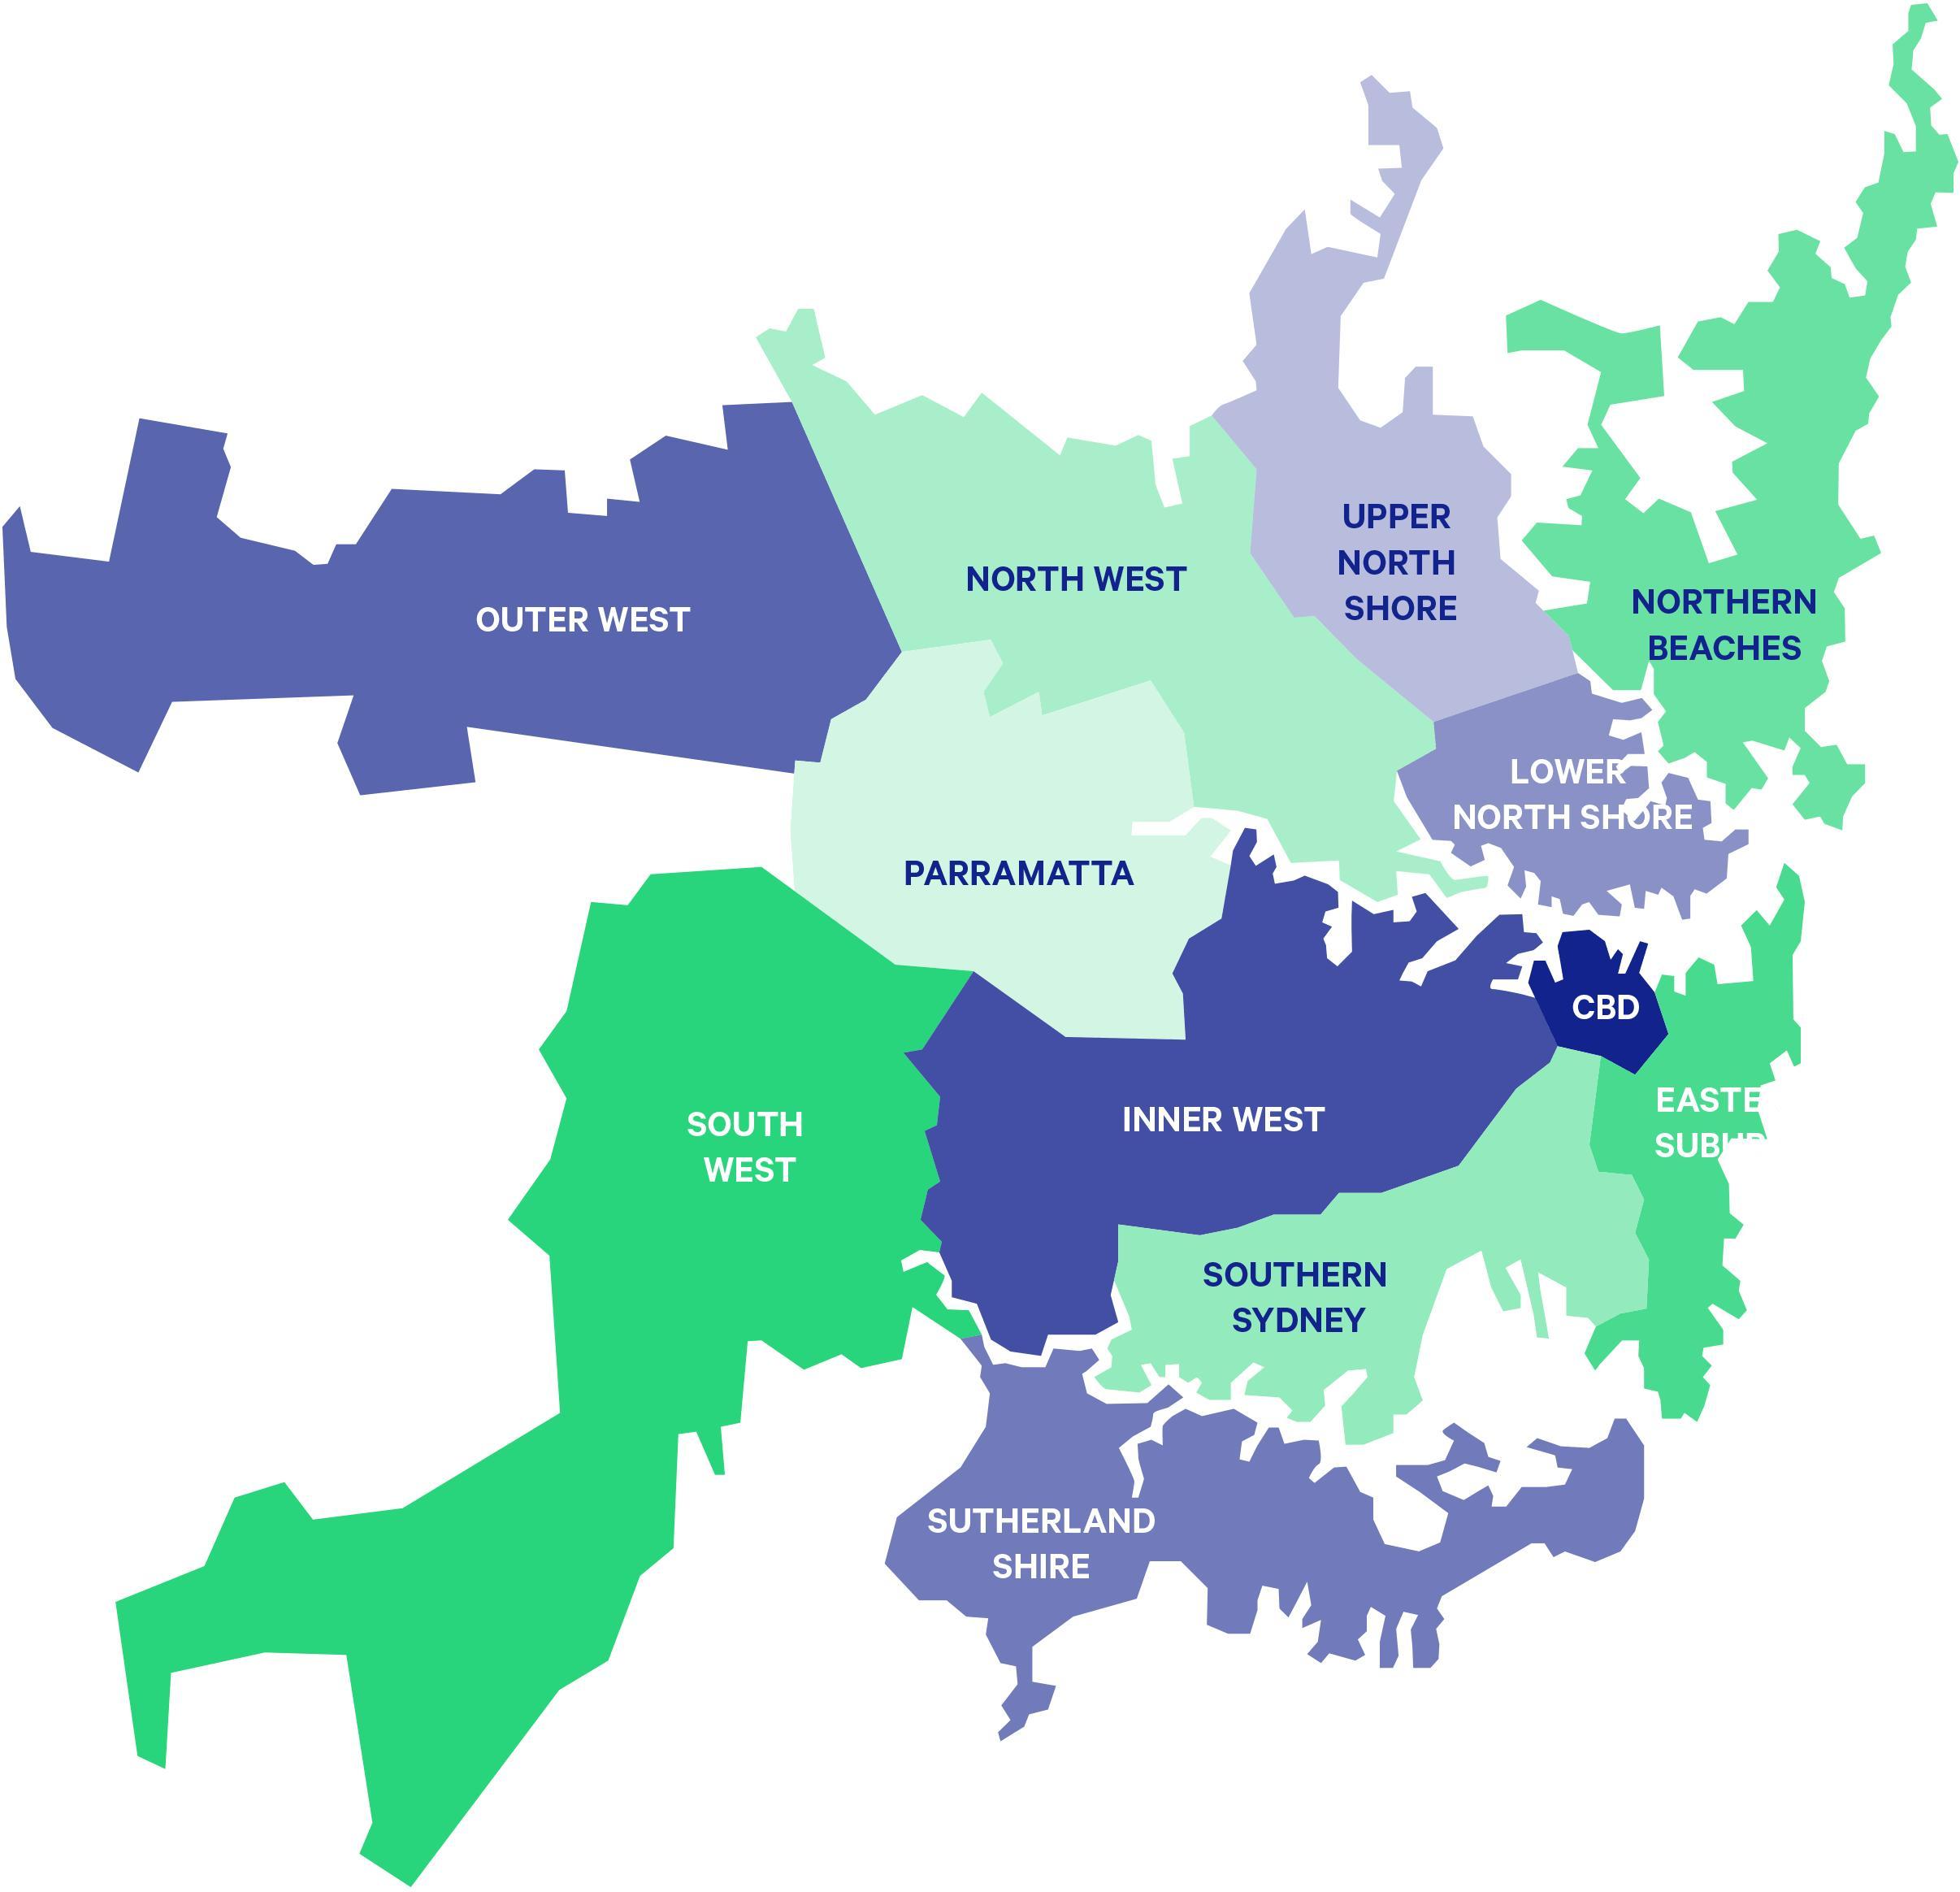 Map Of Australia Sydney.Sydney Suburbs Map Sydney Suburb Map Australia